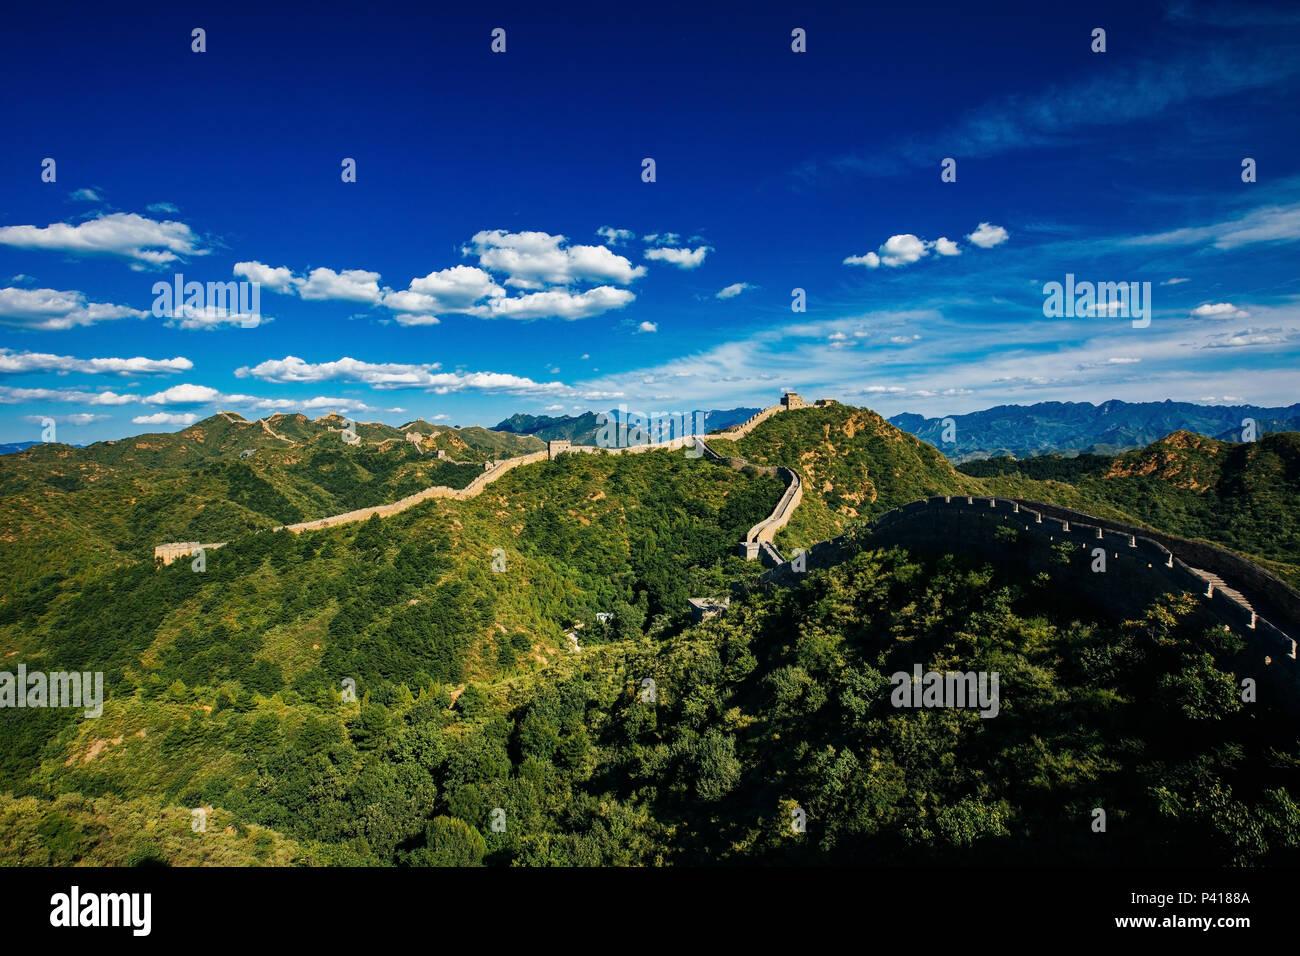 Atardecer en el tour caminando Jinshanling Gran Muralla de China, Beijing, China tour caminando Jinshanling Foto de stock